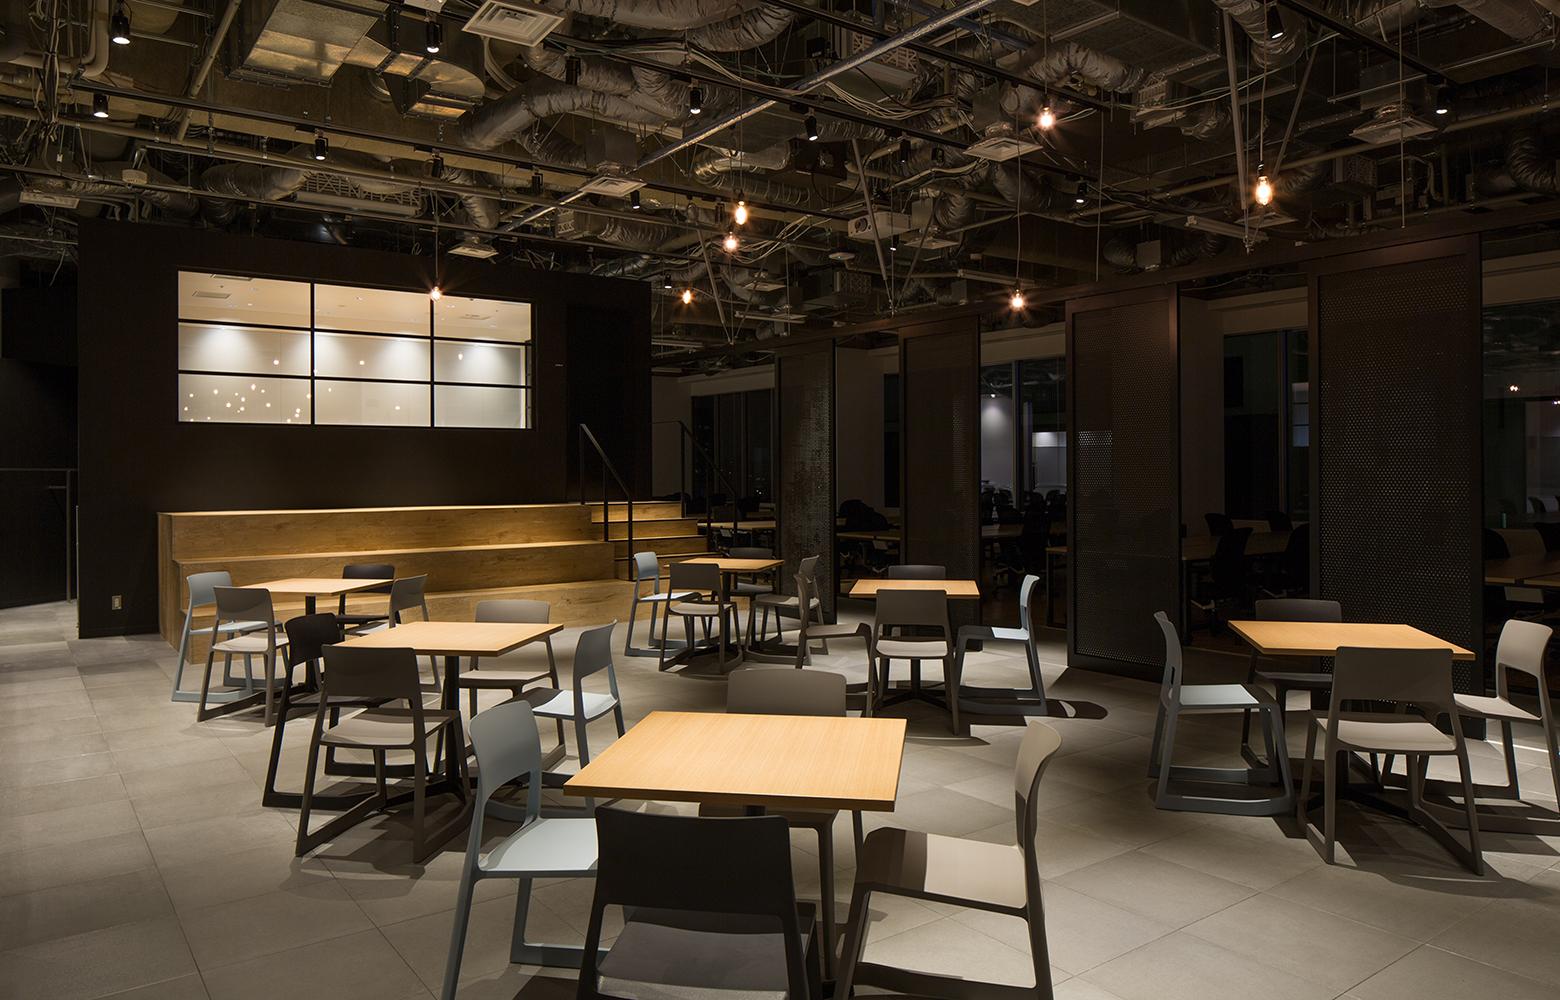 KLab株式会社(Laboratory Office) Meeting Lounge_3 デザイン・レイアウト事例